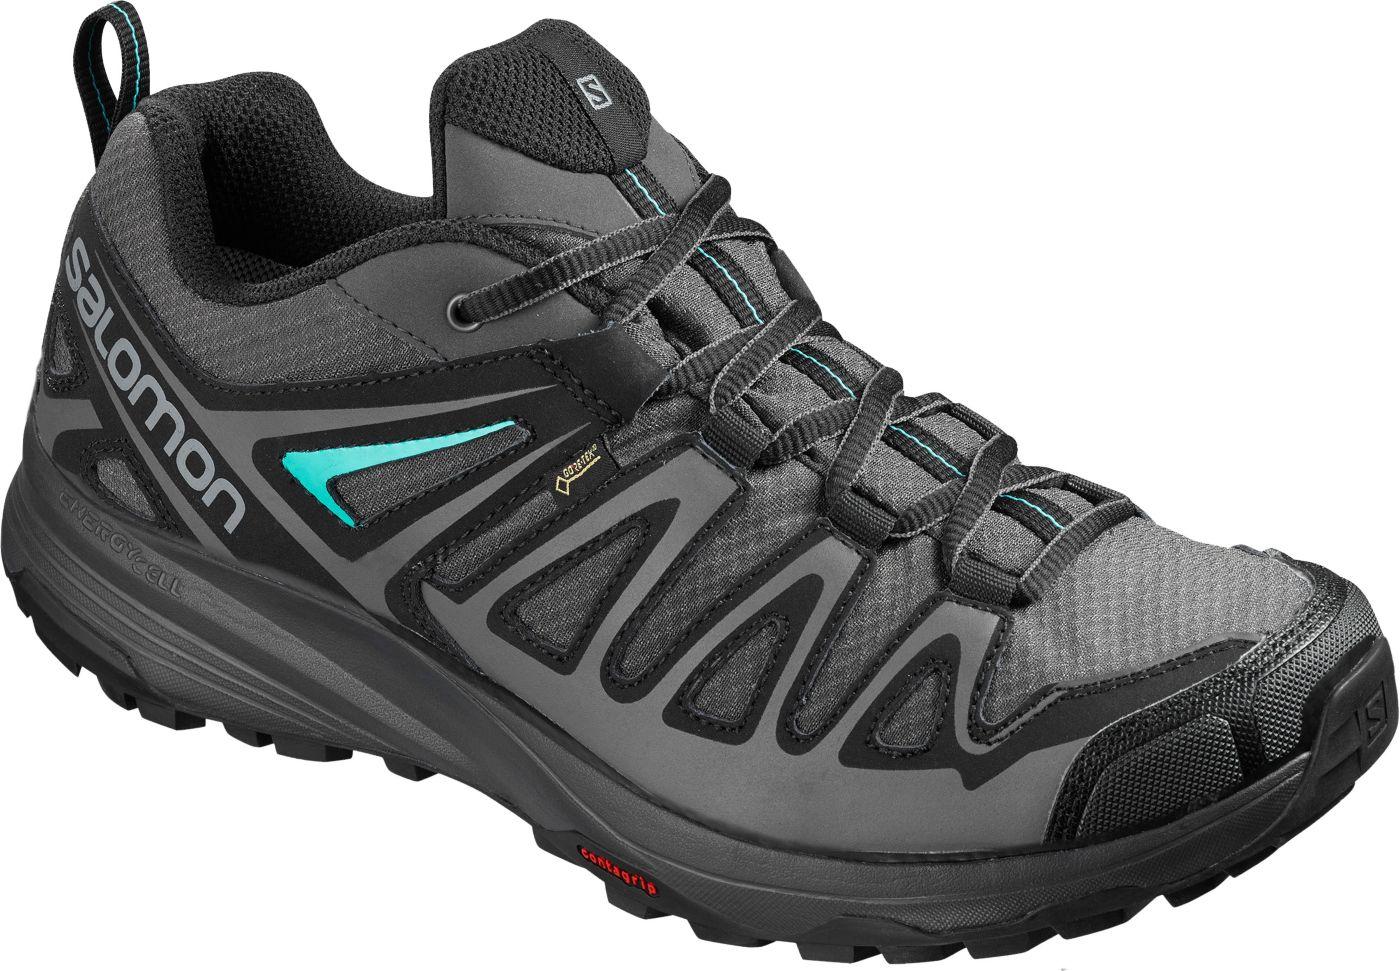 Salomon Women's X Crest GTX Waterproof Hiking Shoes